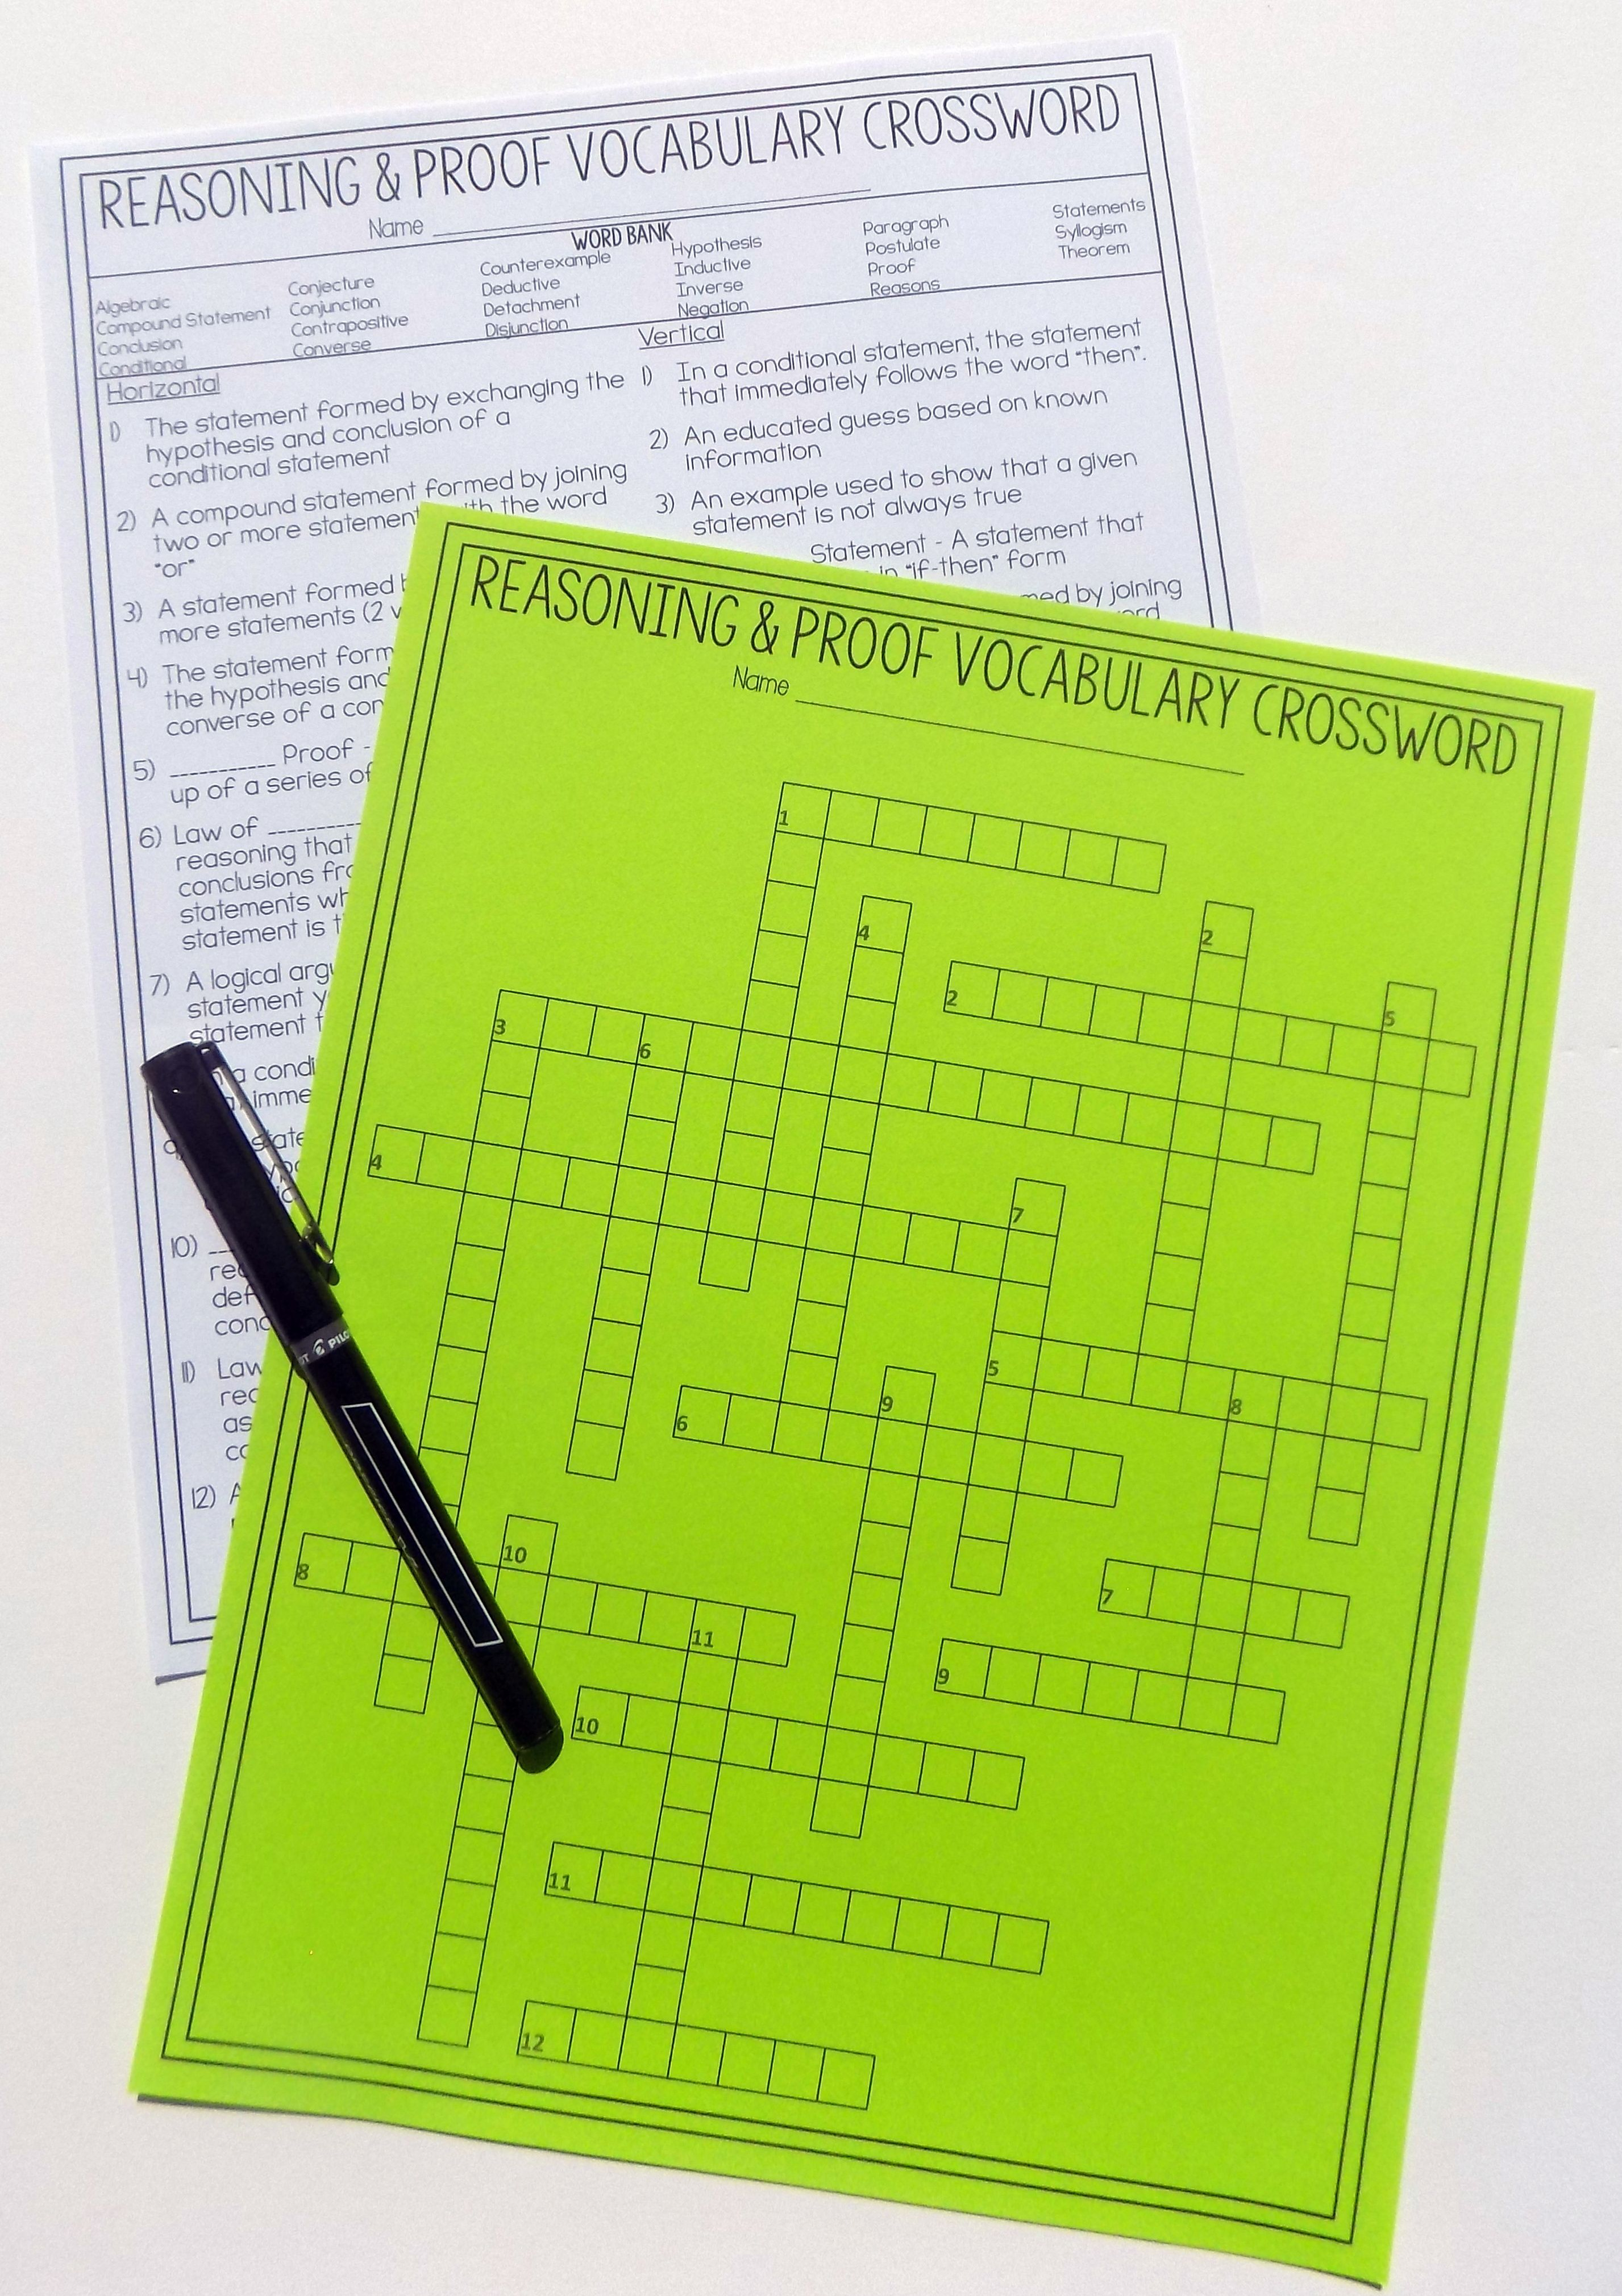 Geometry Chapter 2 Vocabulary Crossword - Reasoning & Proof | Pinterest